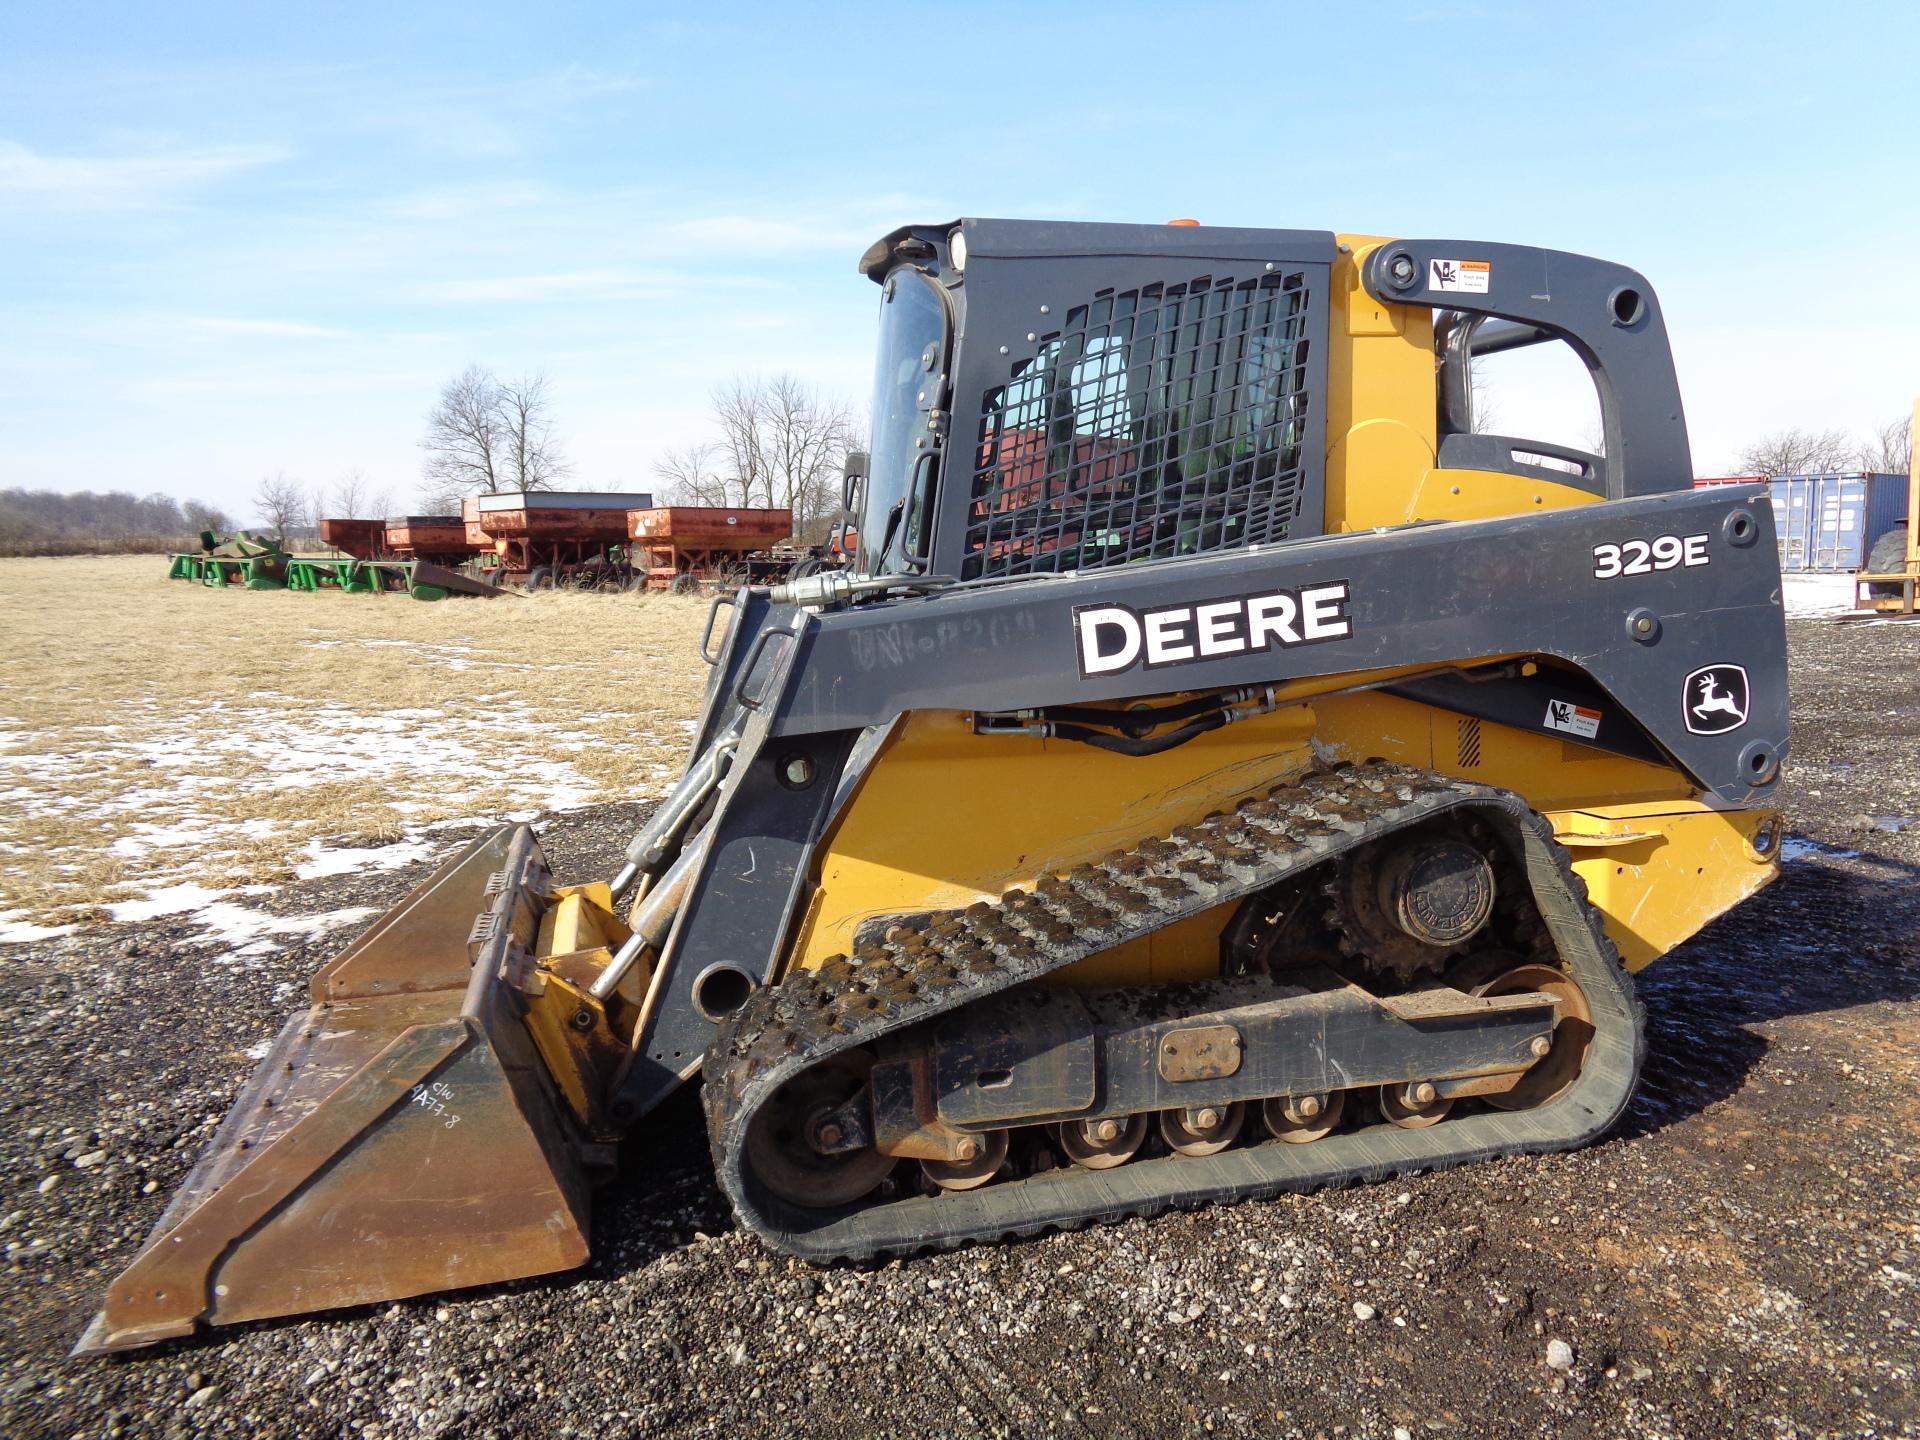 2014 John Deere 329E     $33,900